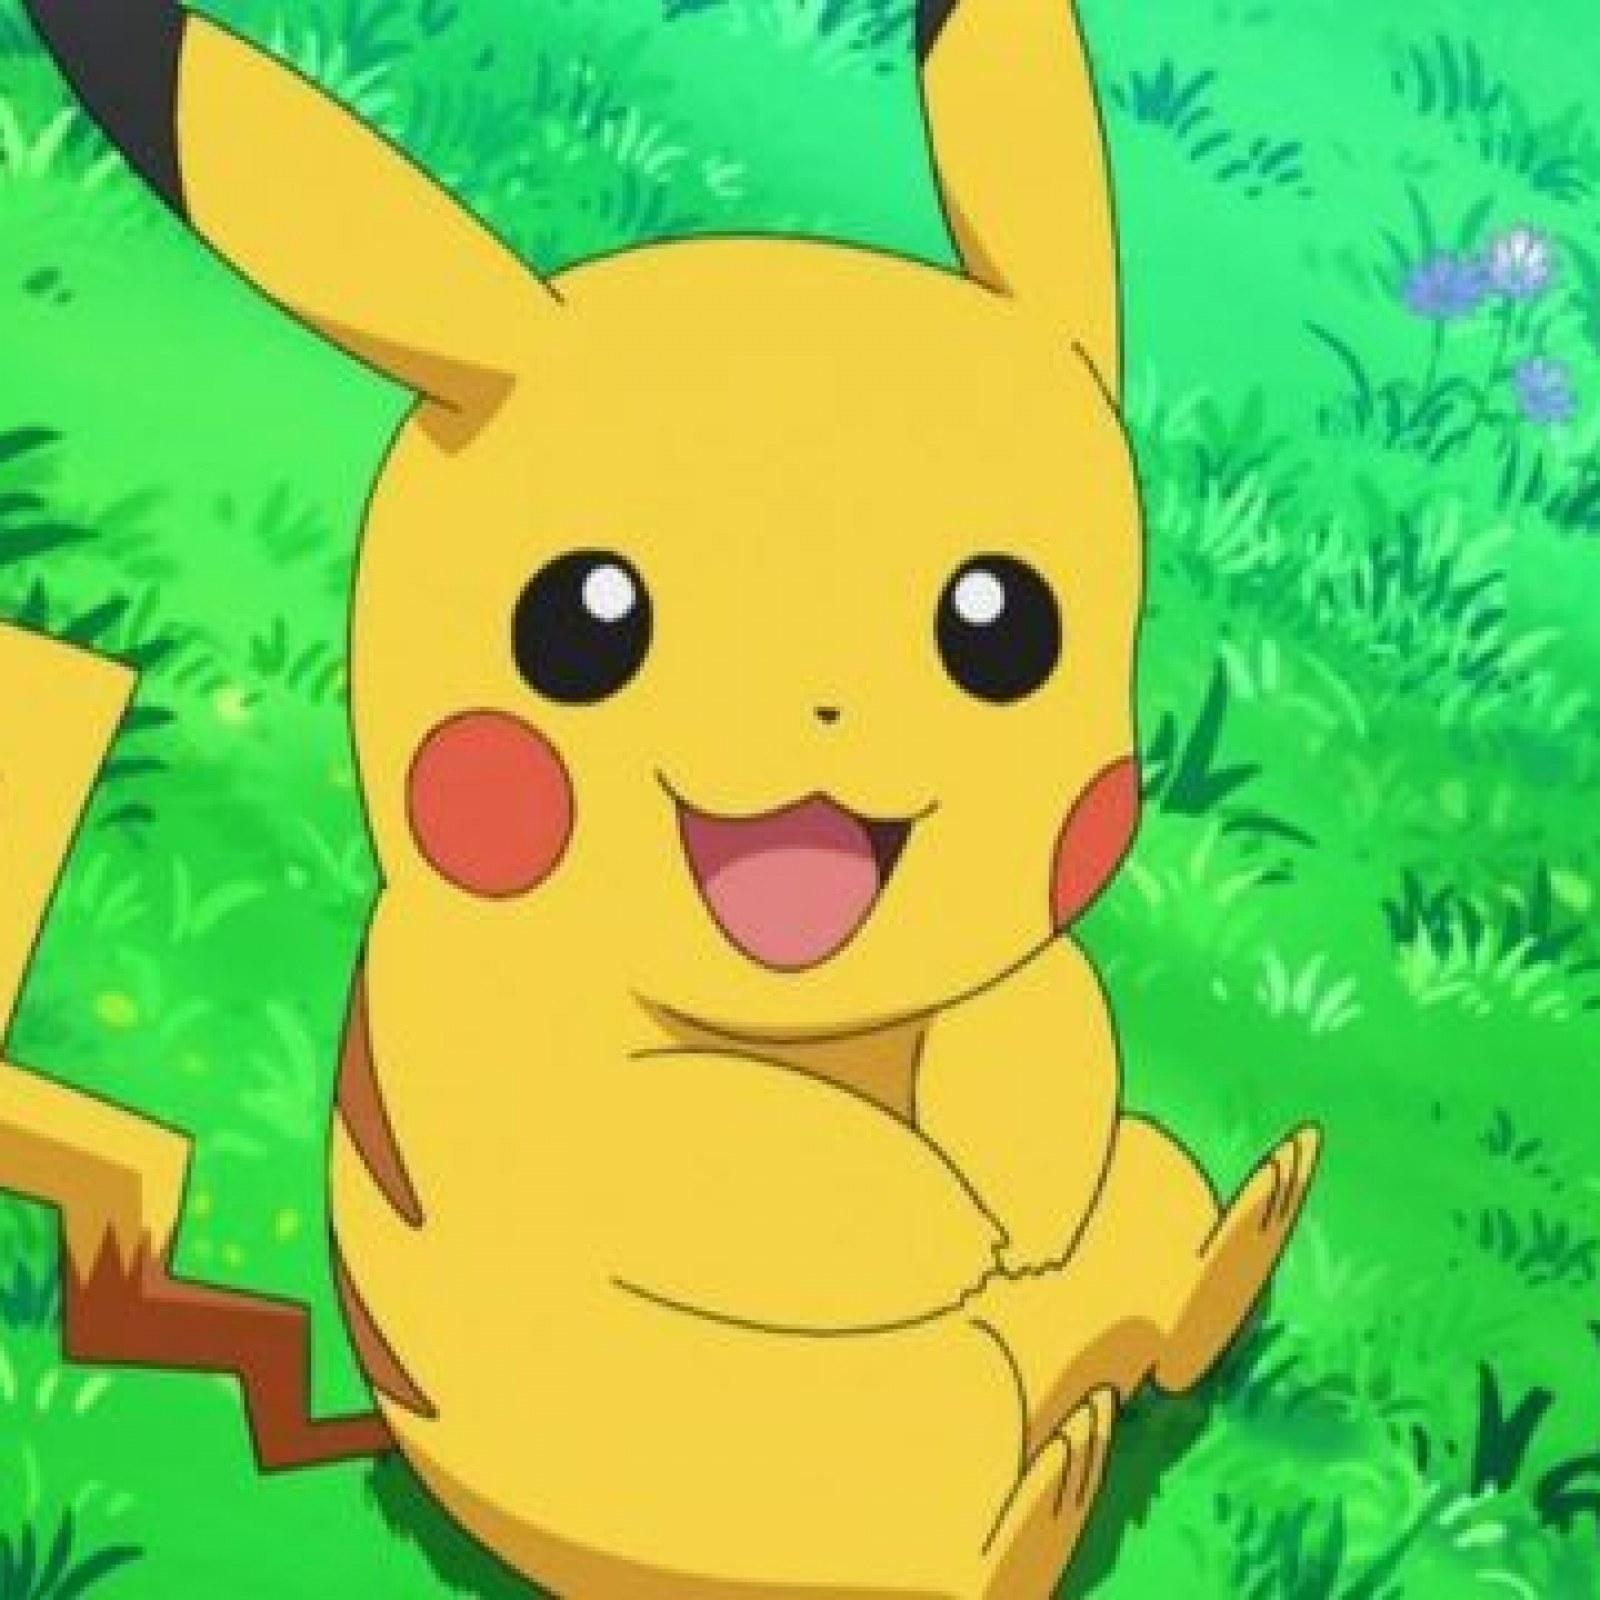 Pikachu Talk App How To Speak With Pokemon On Google Home Or Alexa